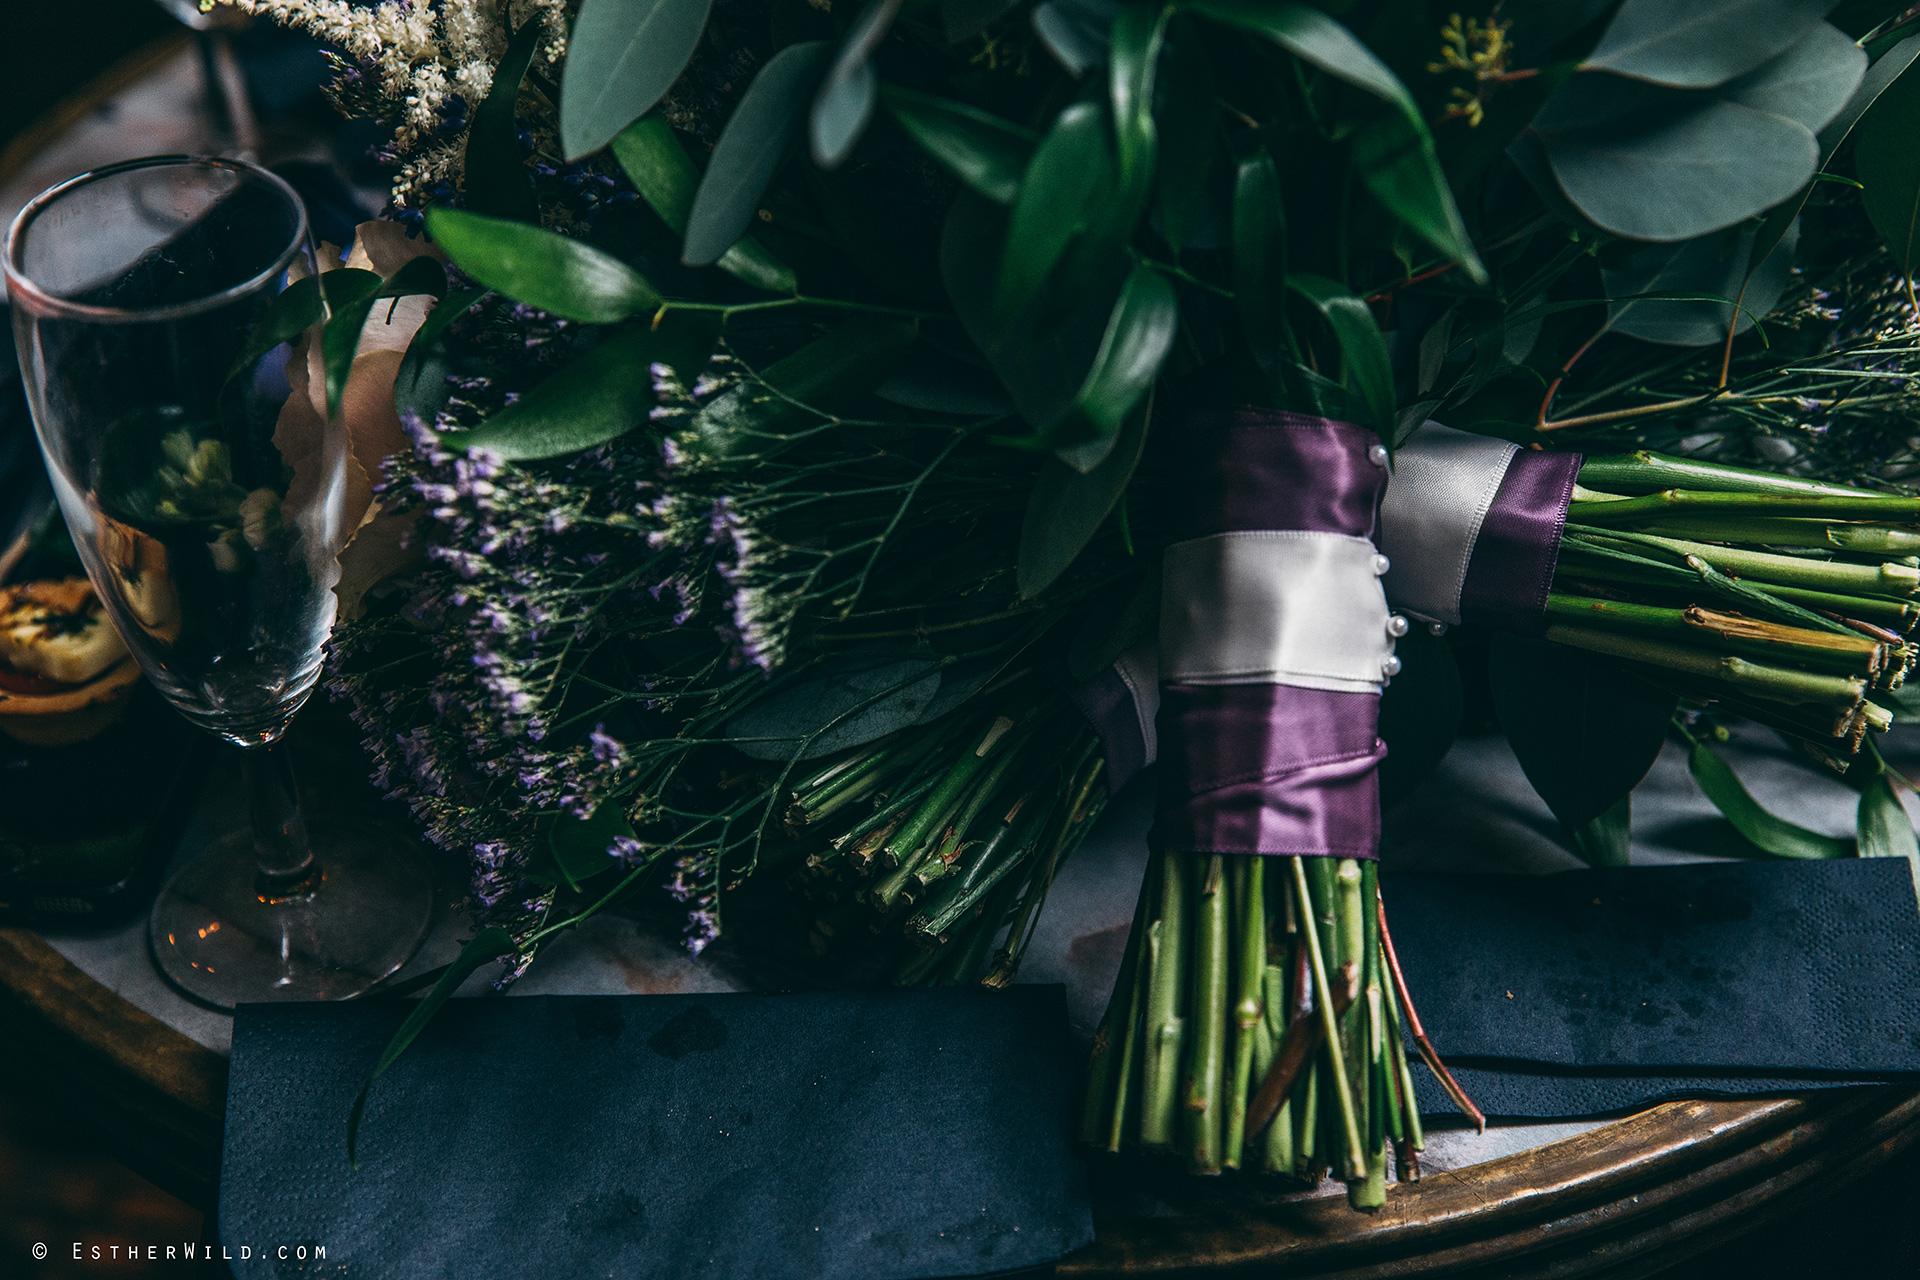 0617_London_Croydon_Clapham_Wedding_Photographer_Esther_Wild_Photography_IMG_6126.jpg